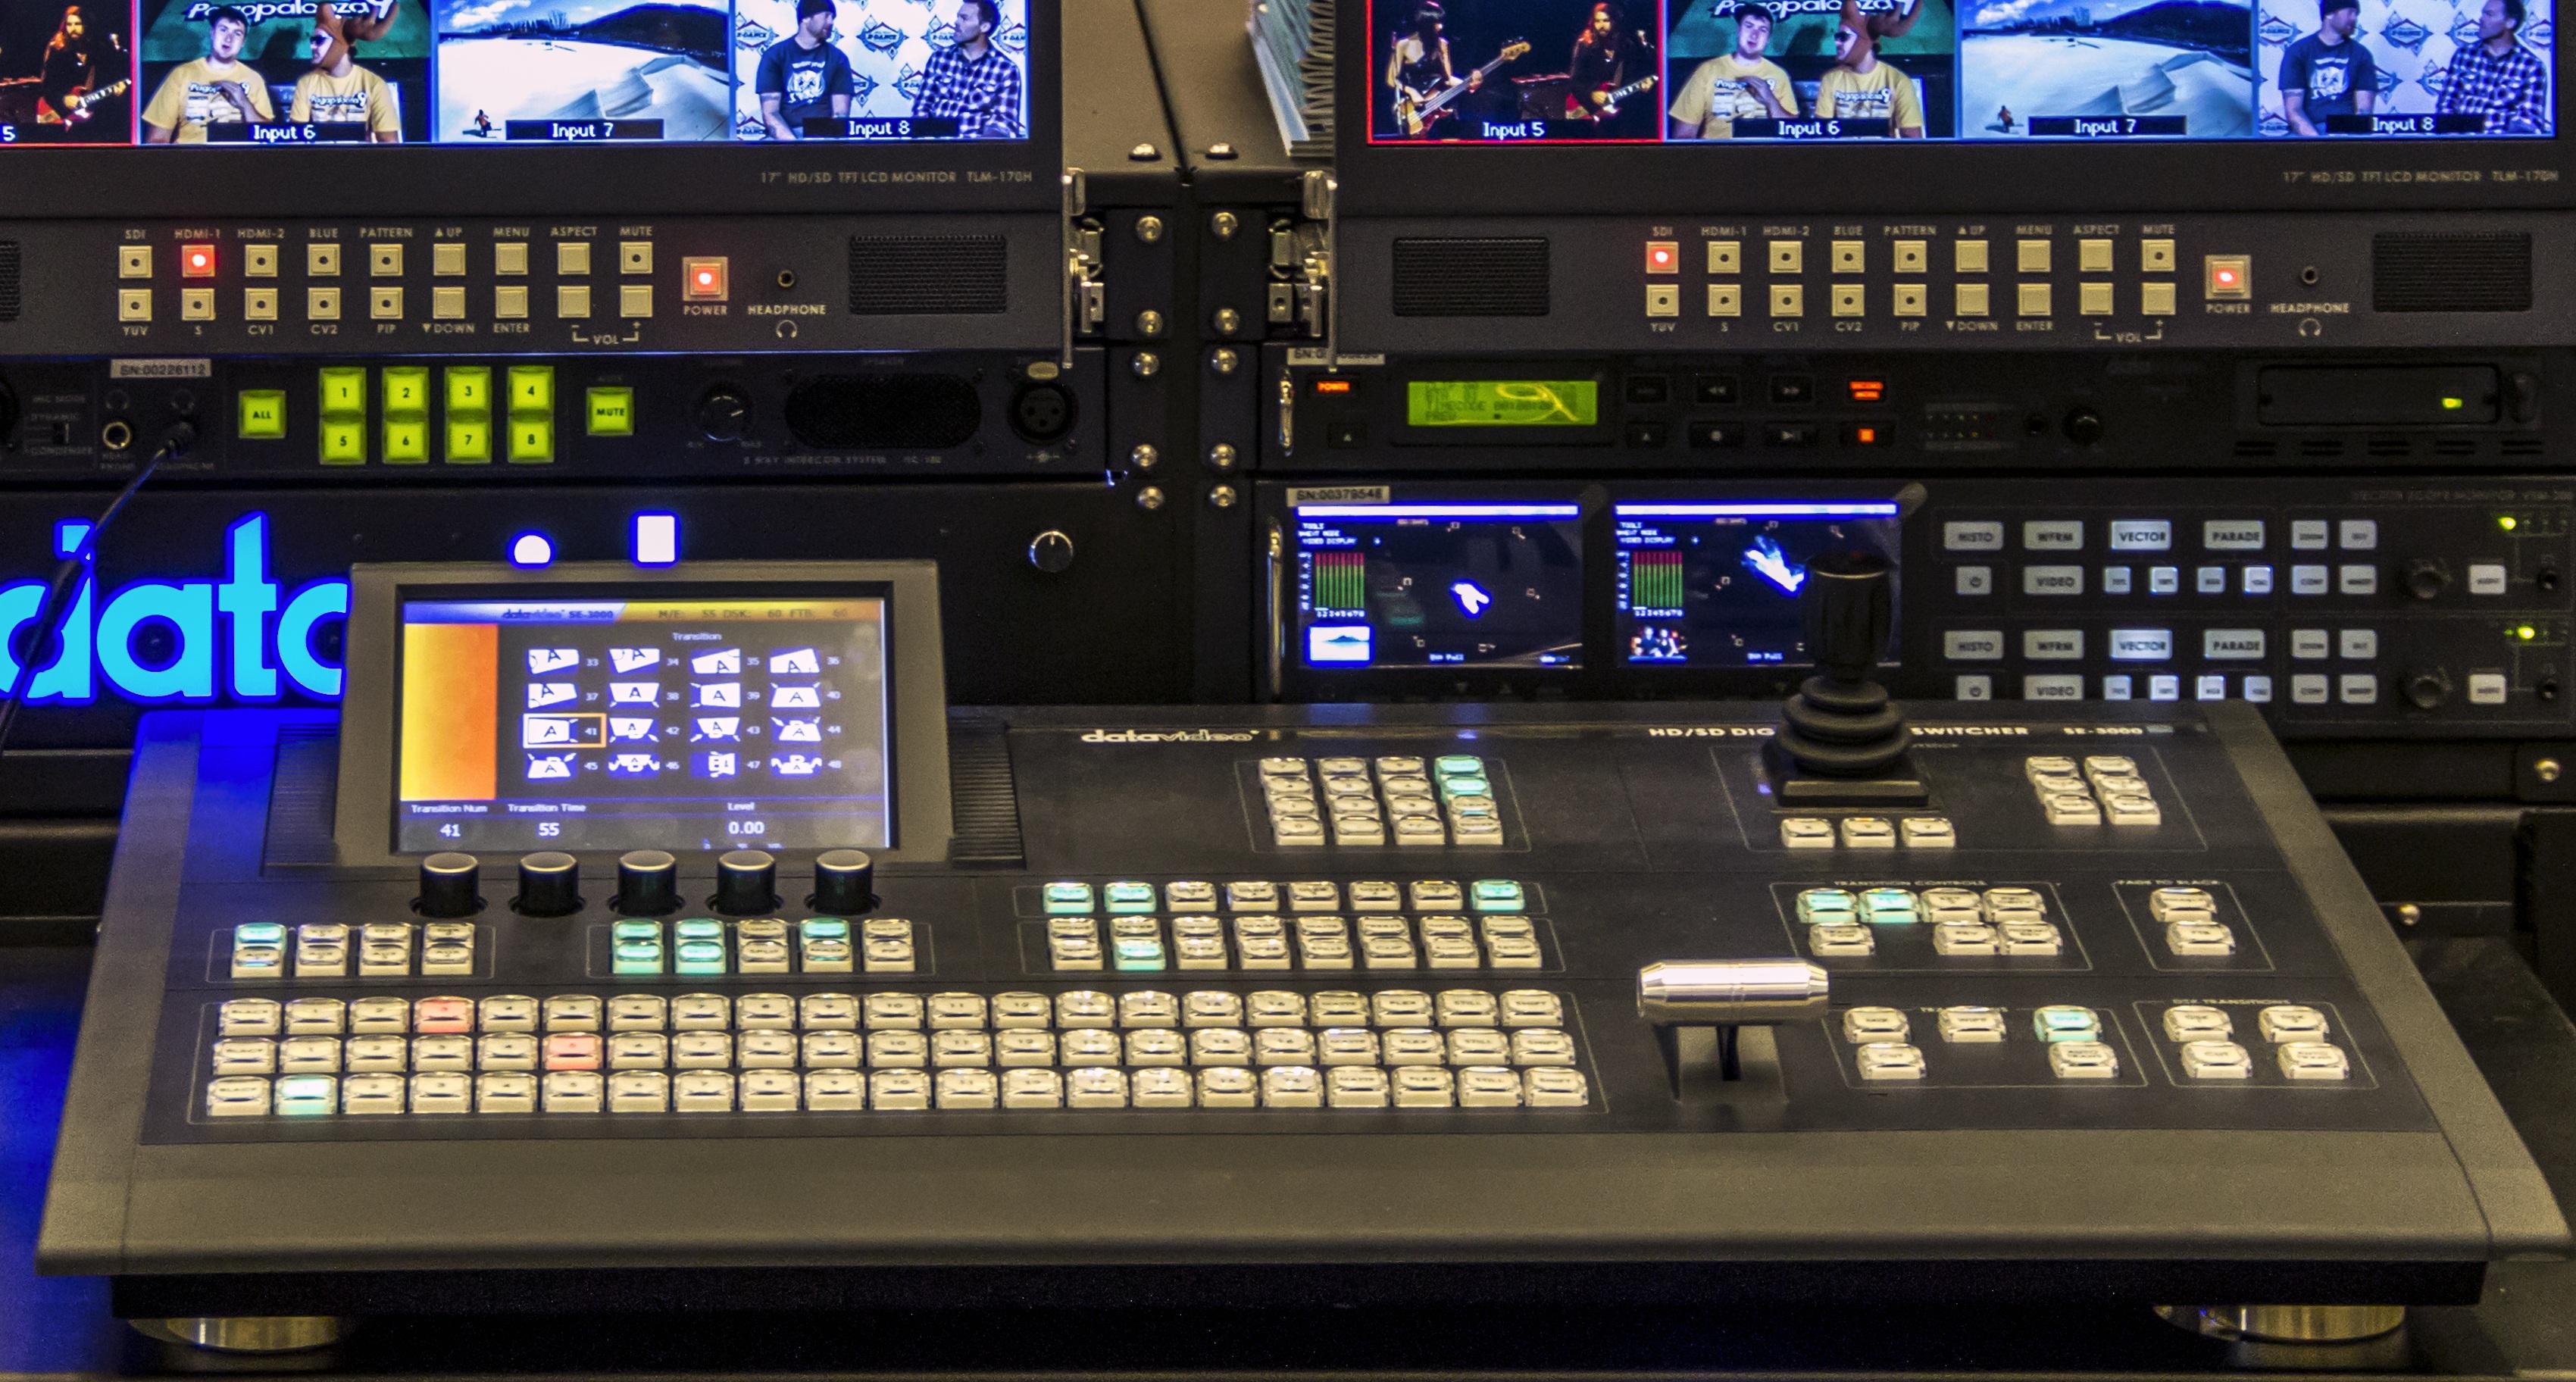 free images technology film equipment studio